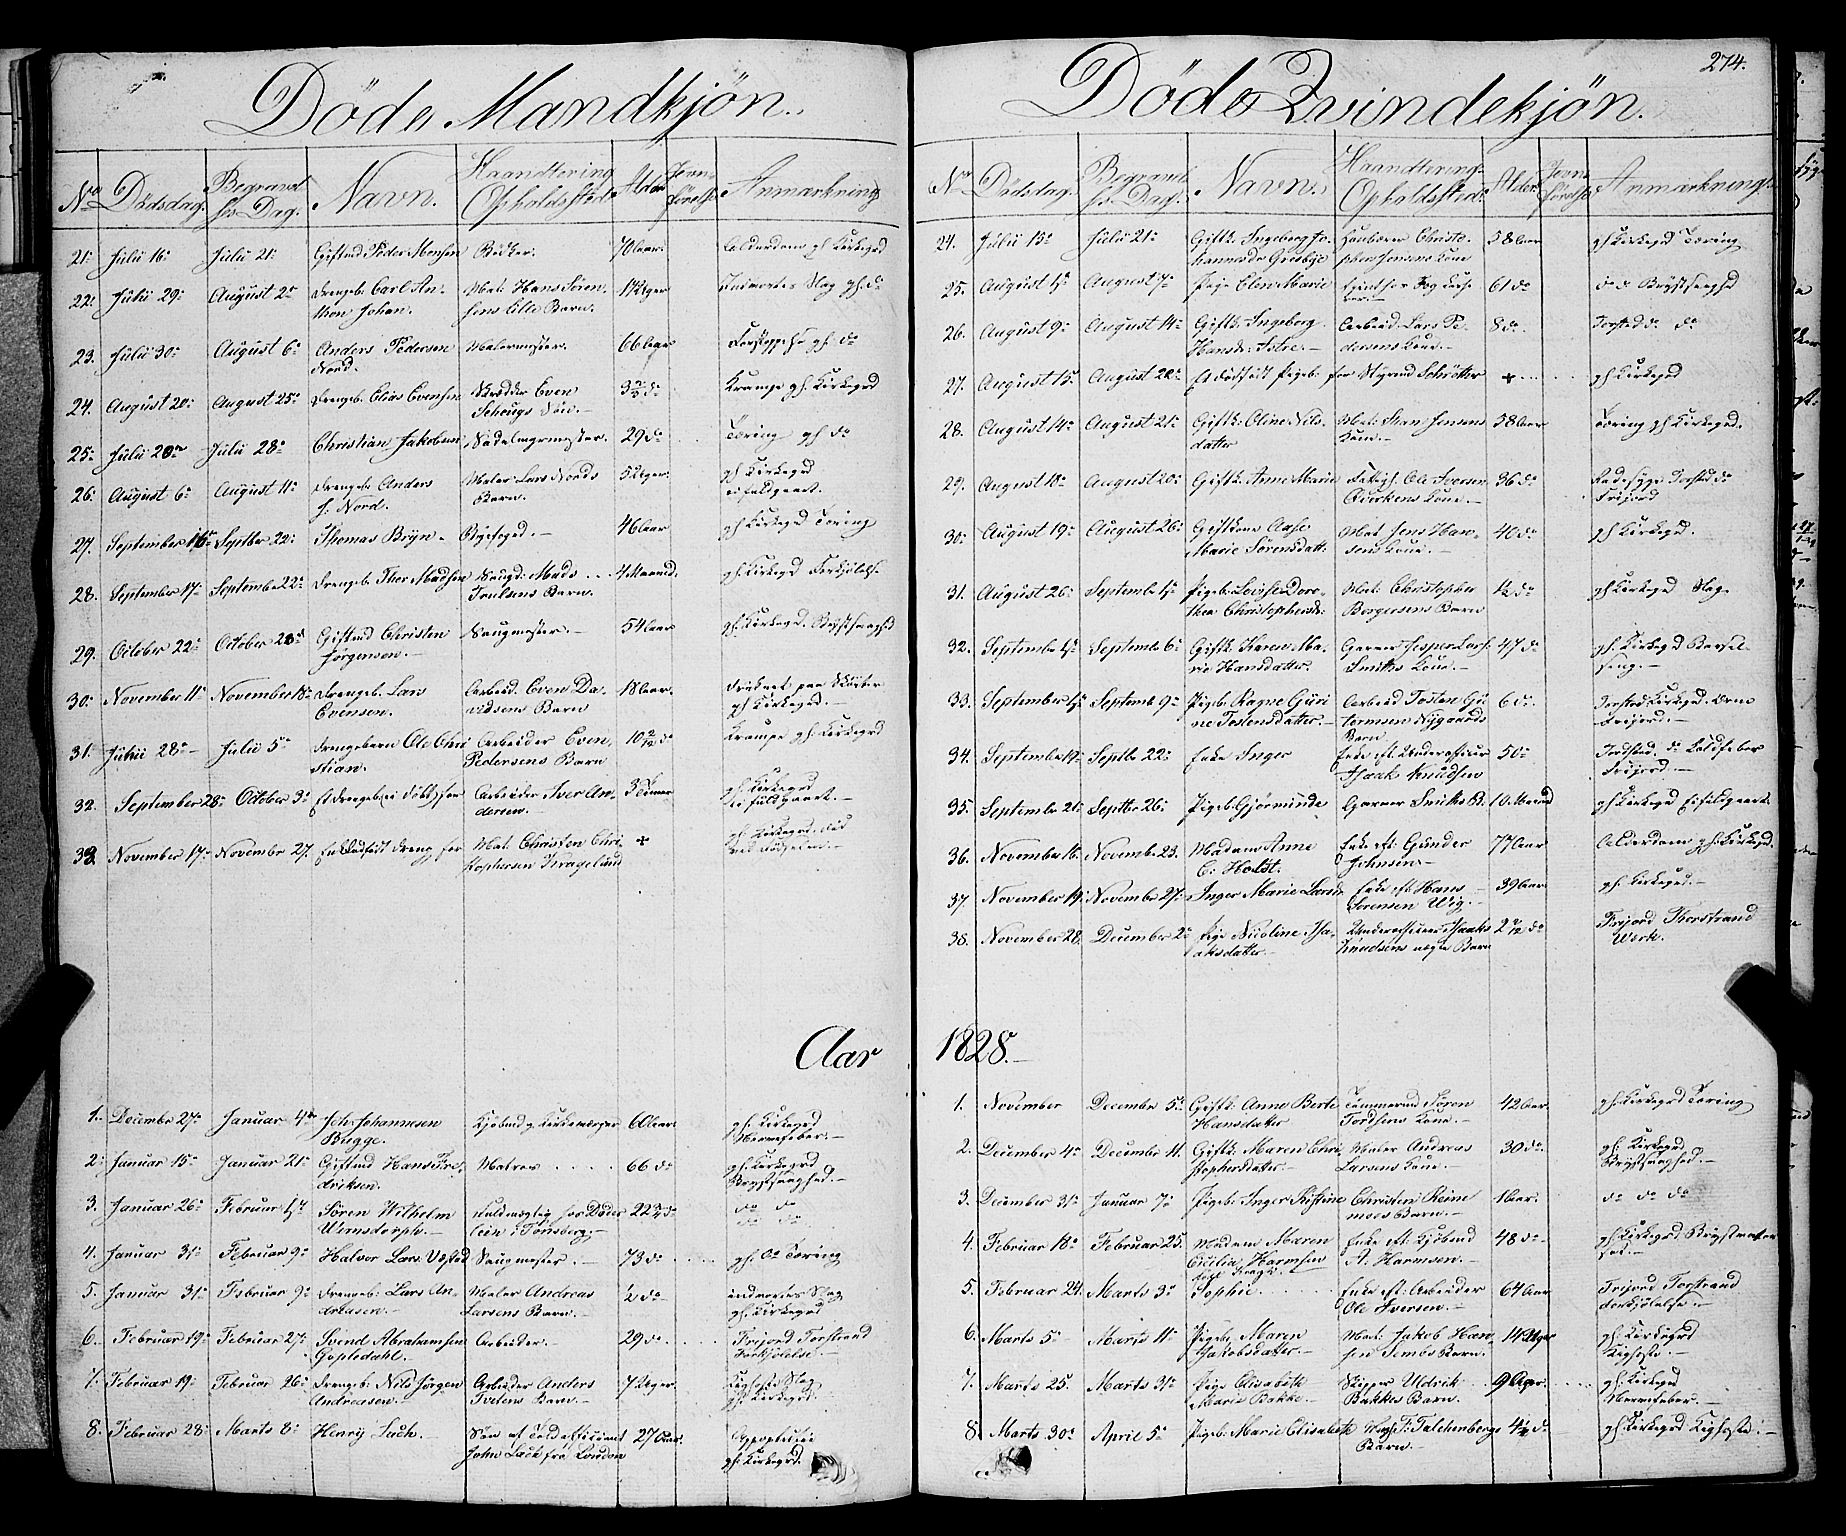 SAKO, Larvik kirkebøker, F/Fa/L0002: Ministerialbok nr. I 2, 1825-1847, s. 274